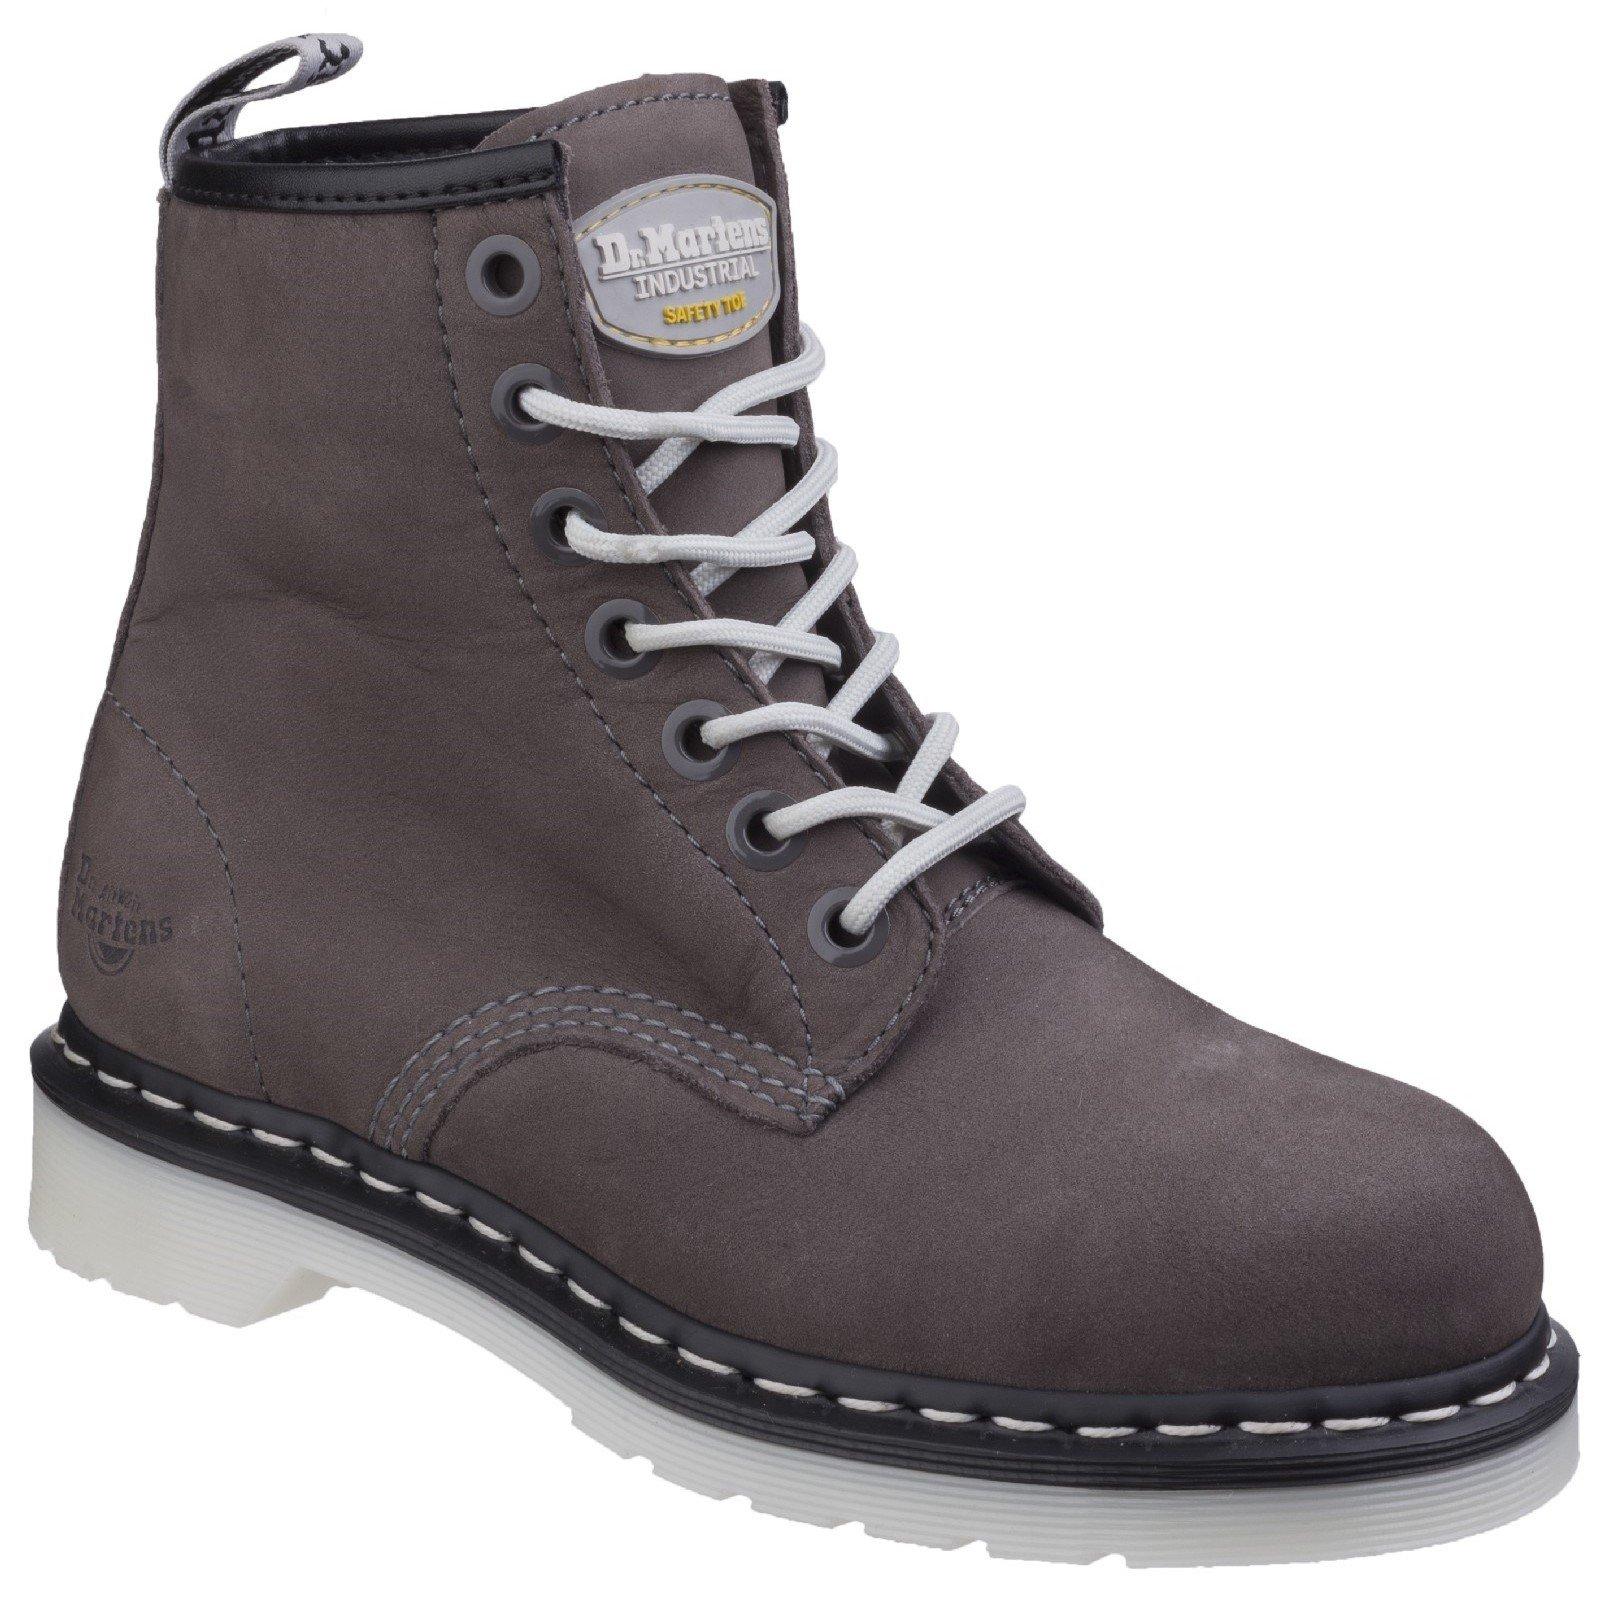 Dr Martens Women's Maple Classic Steel-Toe Work Boot Grey 26783 - Grey Wind River 3